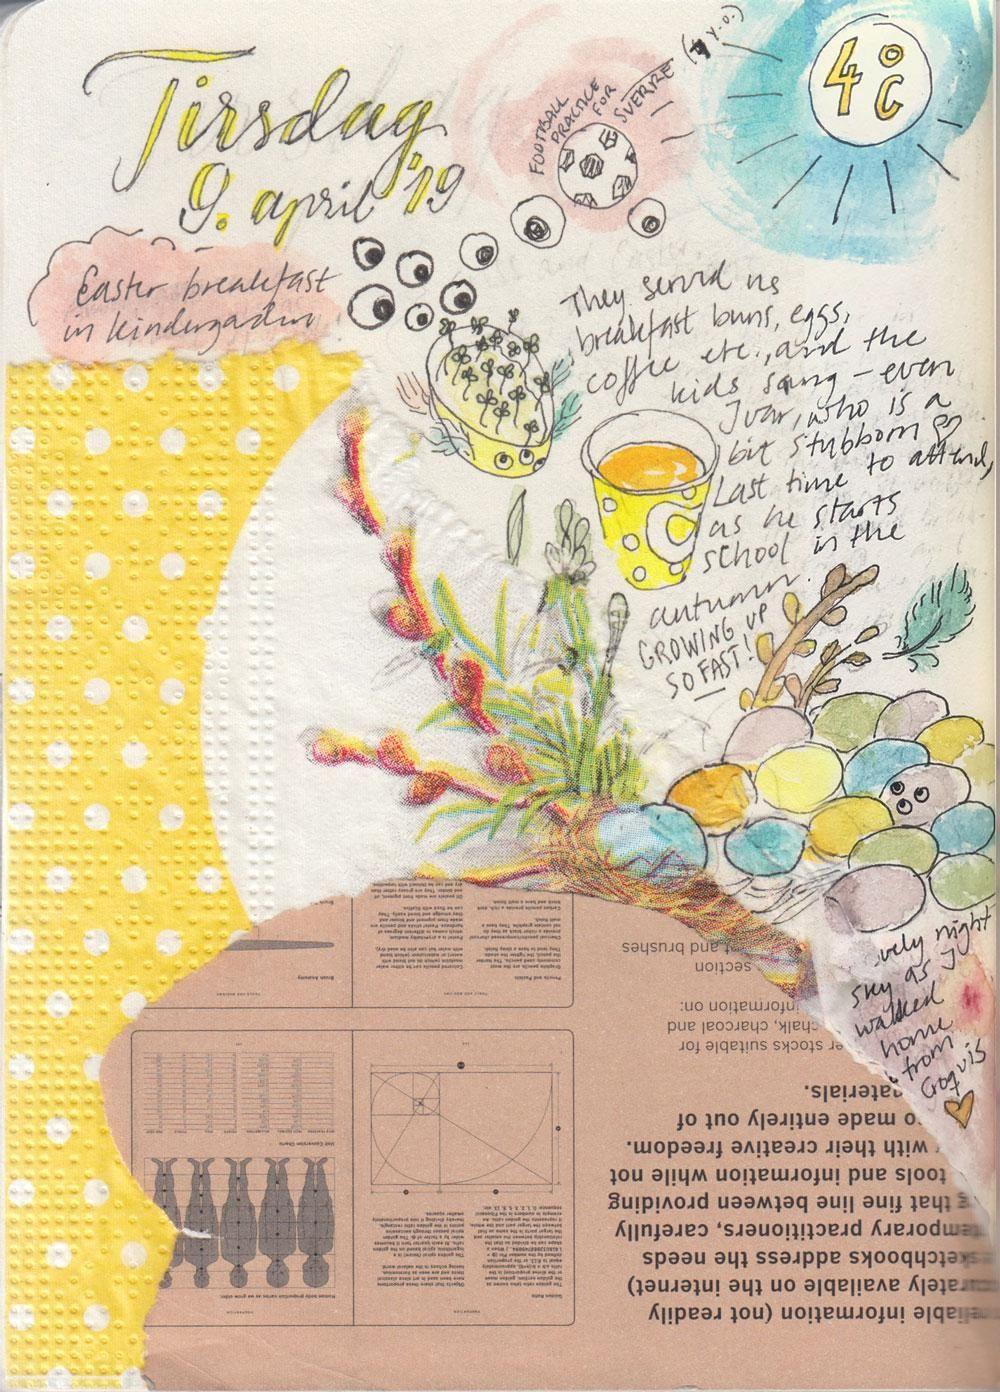 My Sketckbook Journal April 2 2019 - image 3 - student project